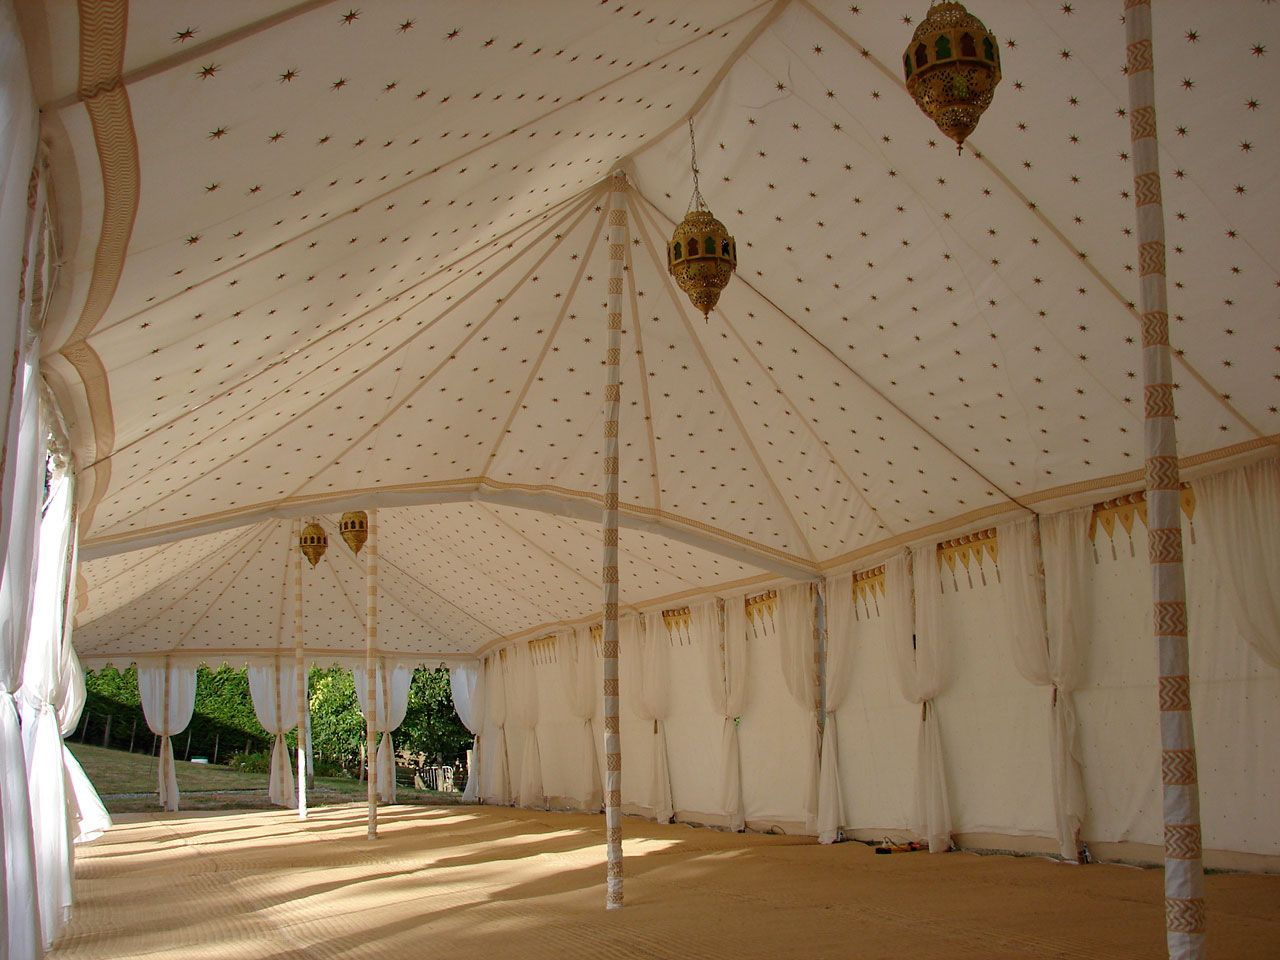 Tents And Furniture Hire Weddings Birthdays Corporate Raj Tent Club Nz Double Maharaja Tent Decorations Woodland Theme Wedding Wedding Tent